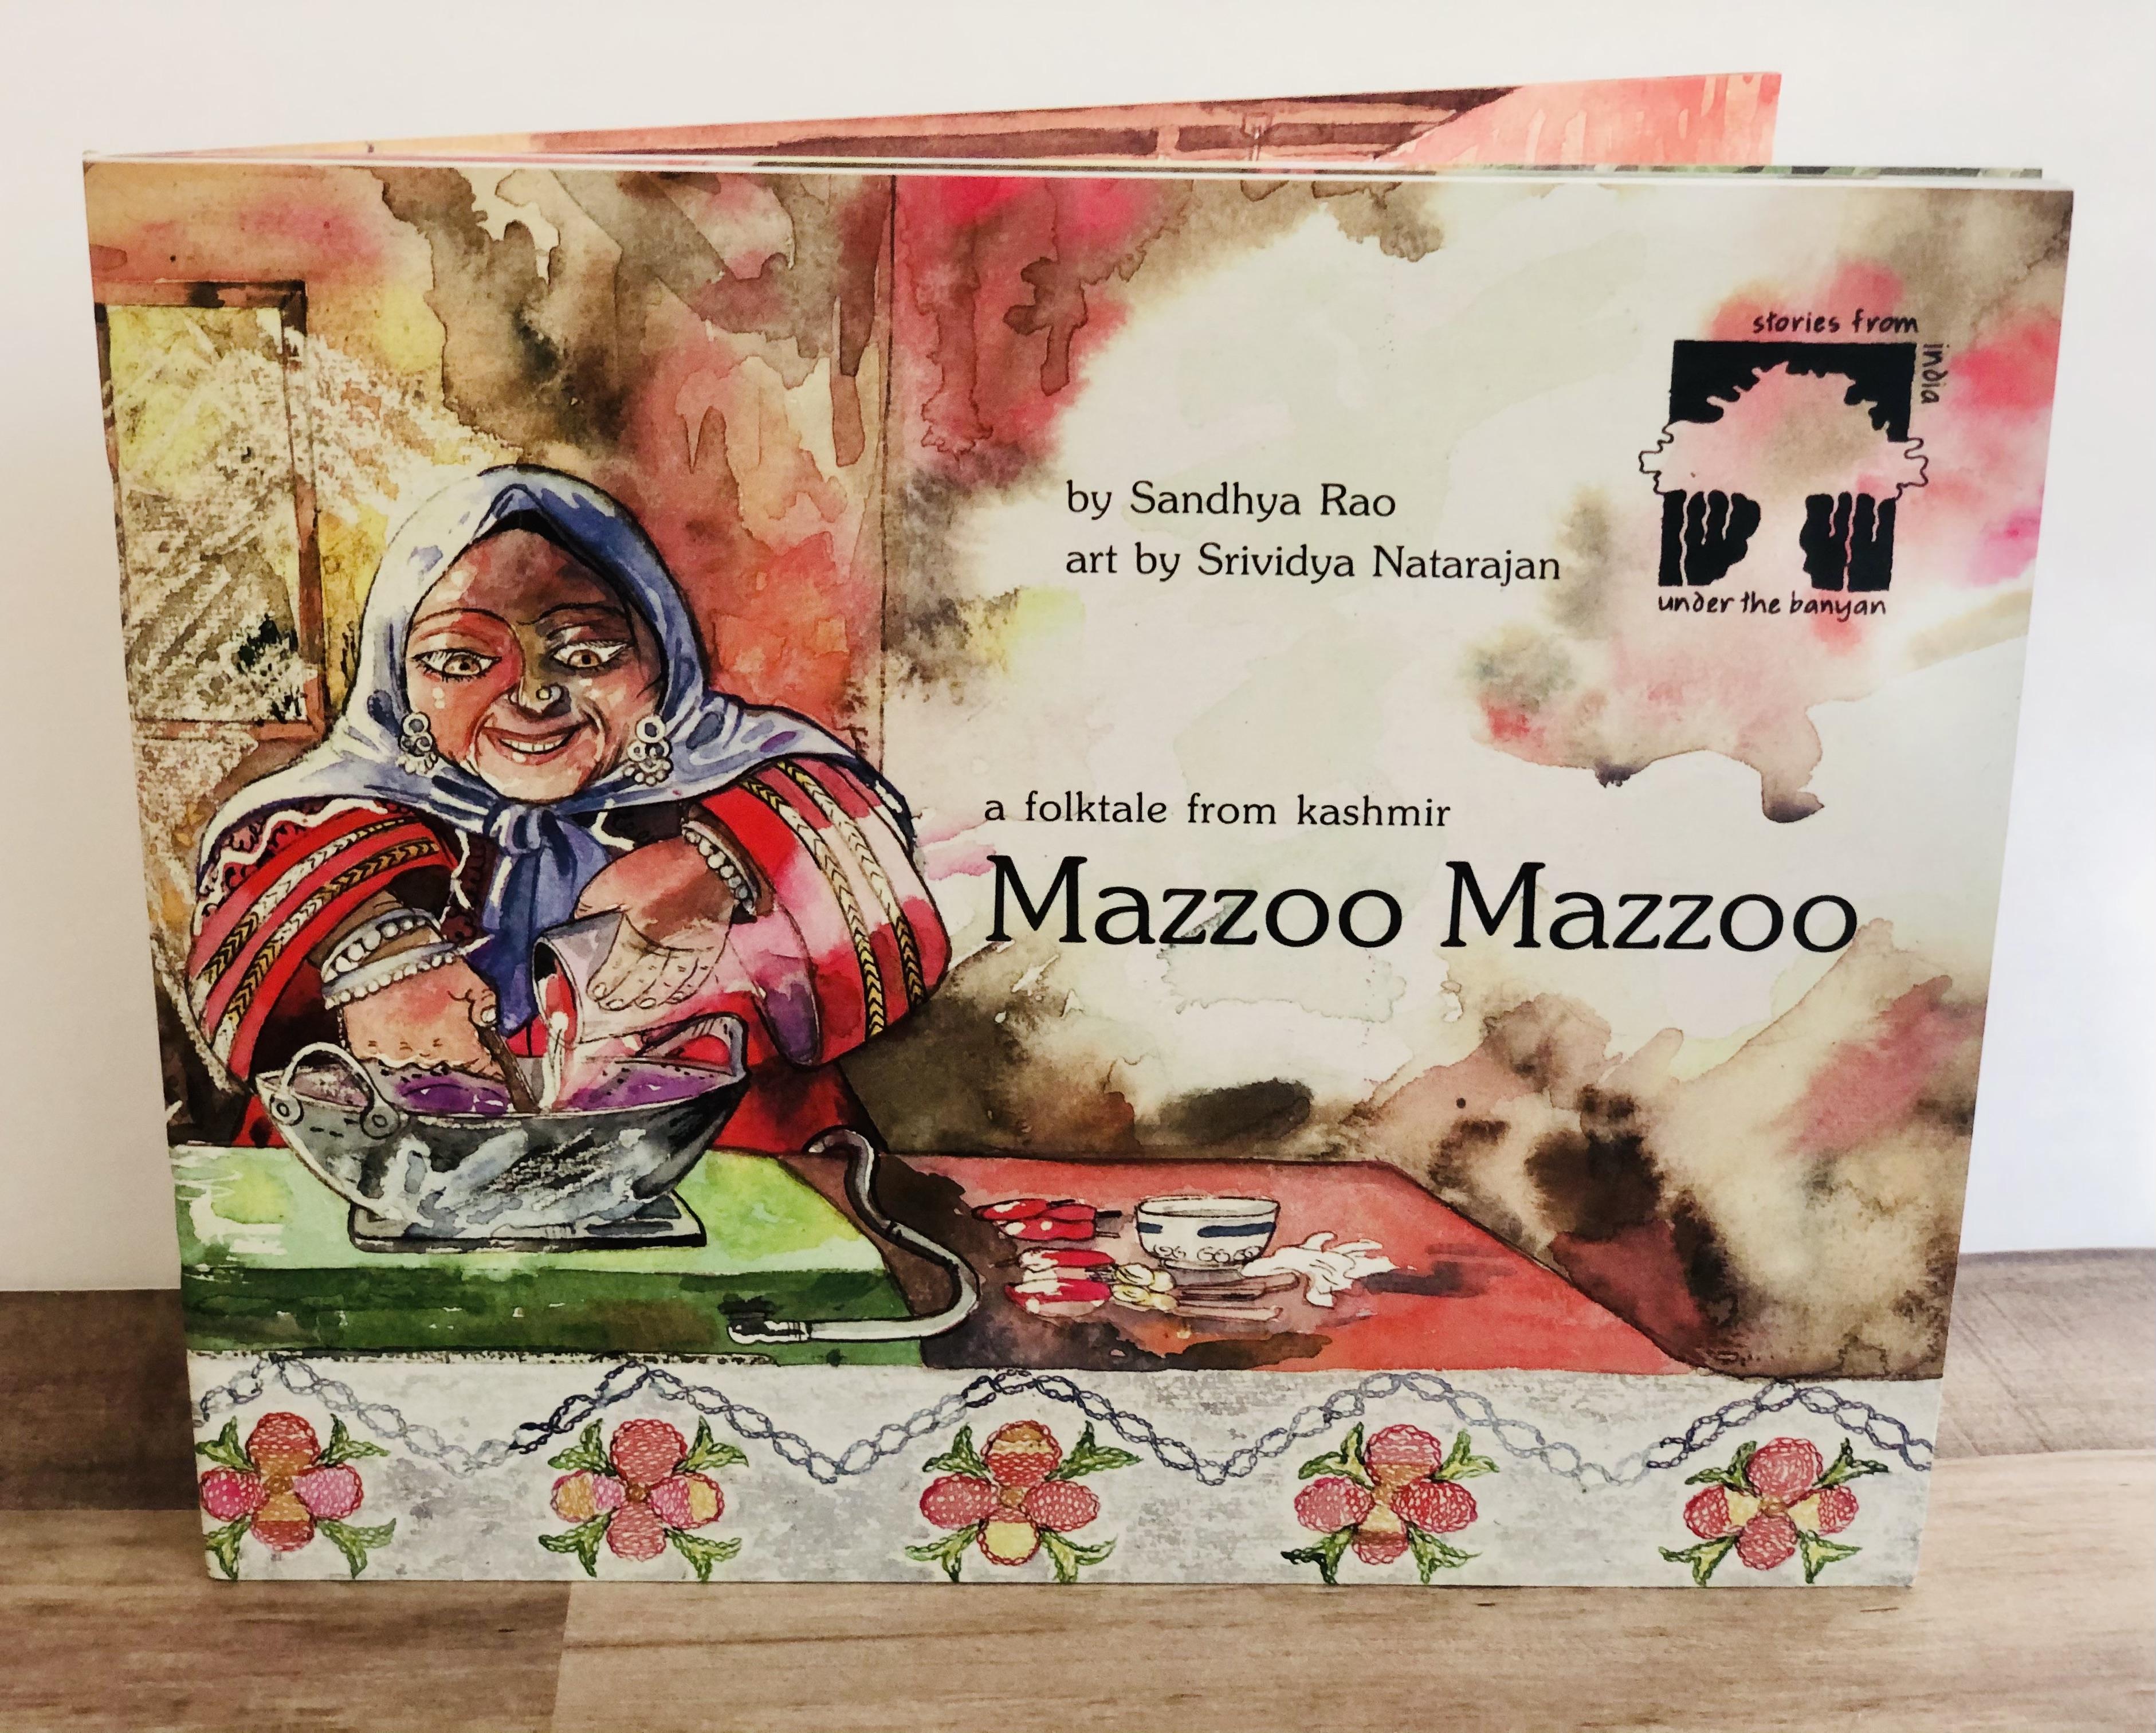 Mazzoo Mazzoo